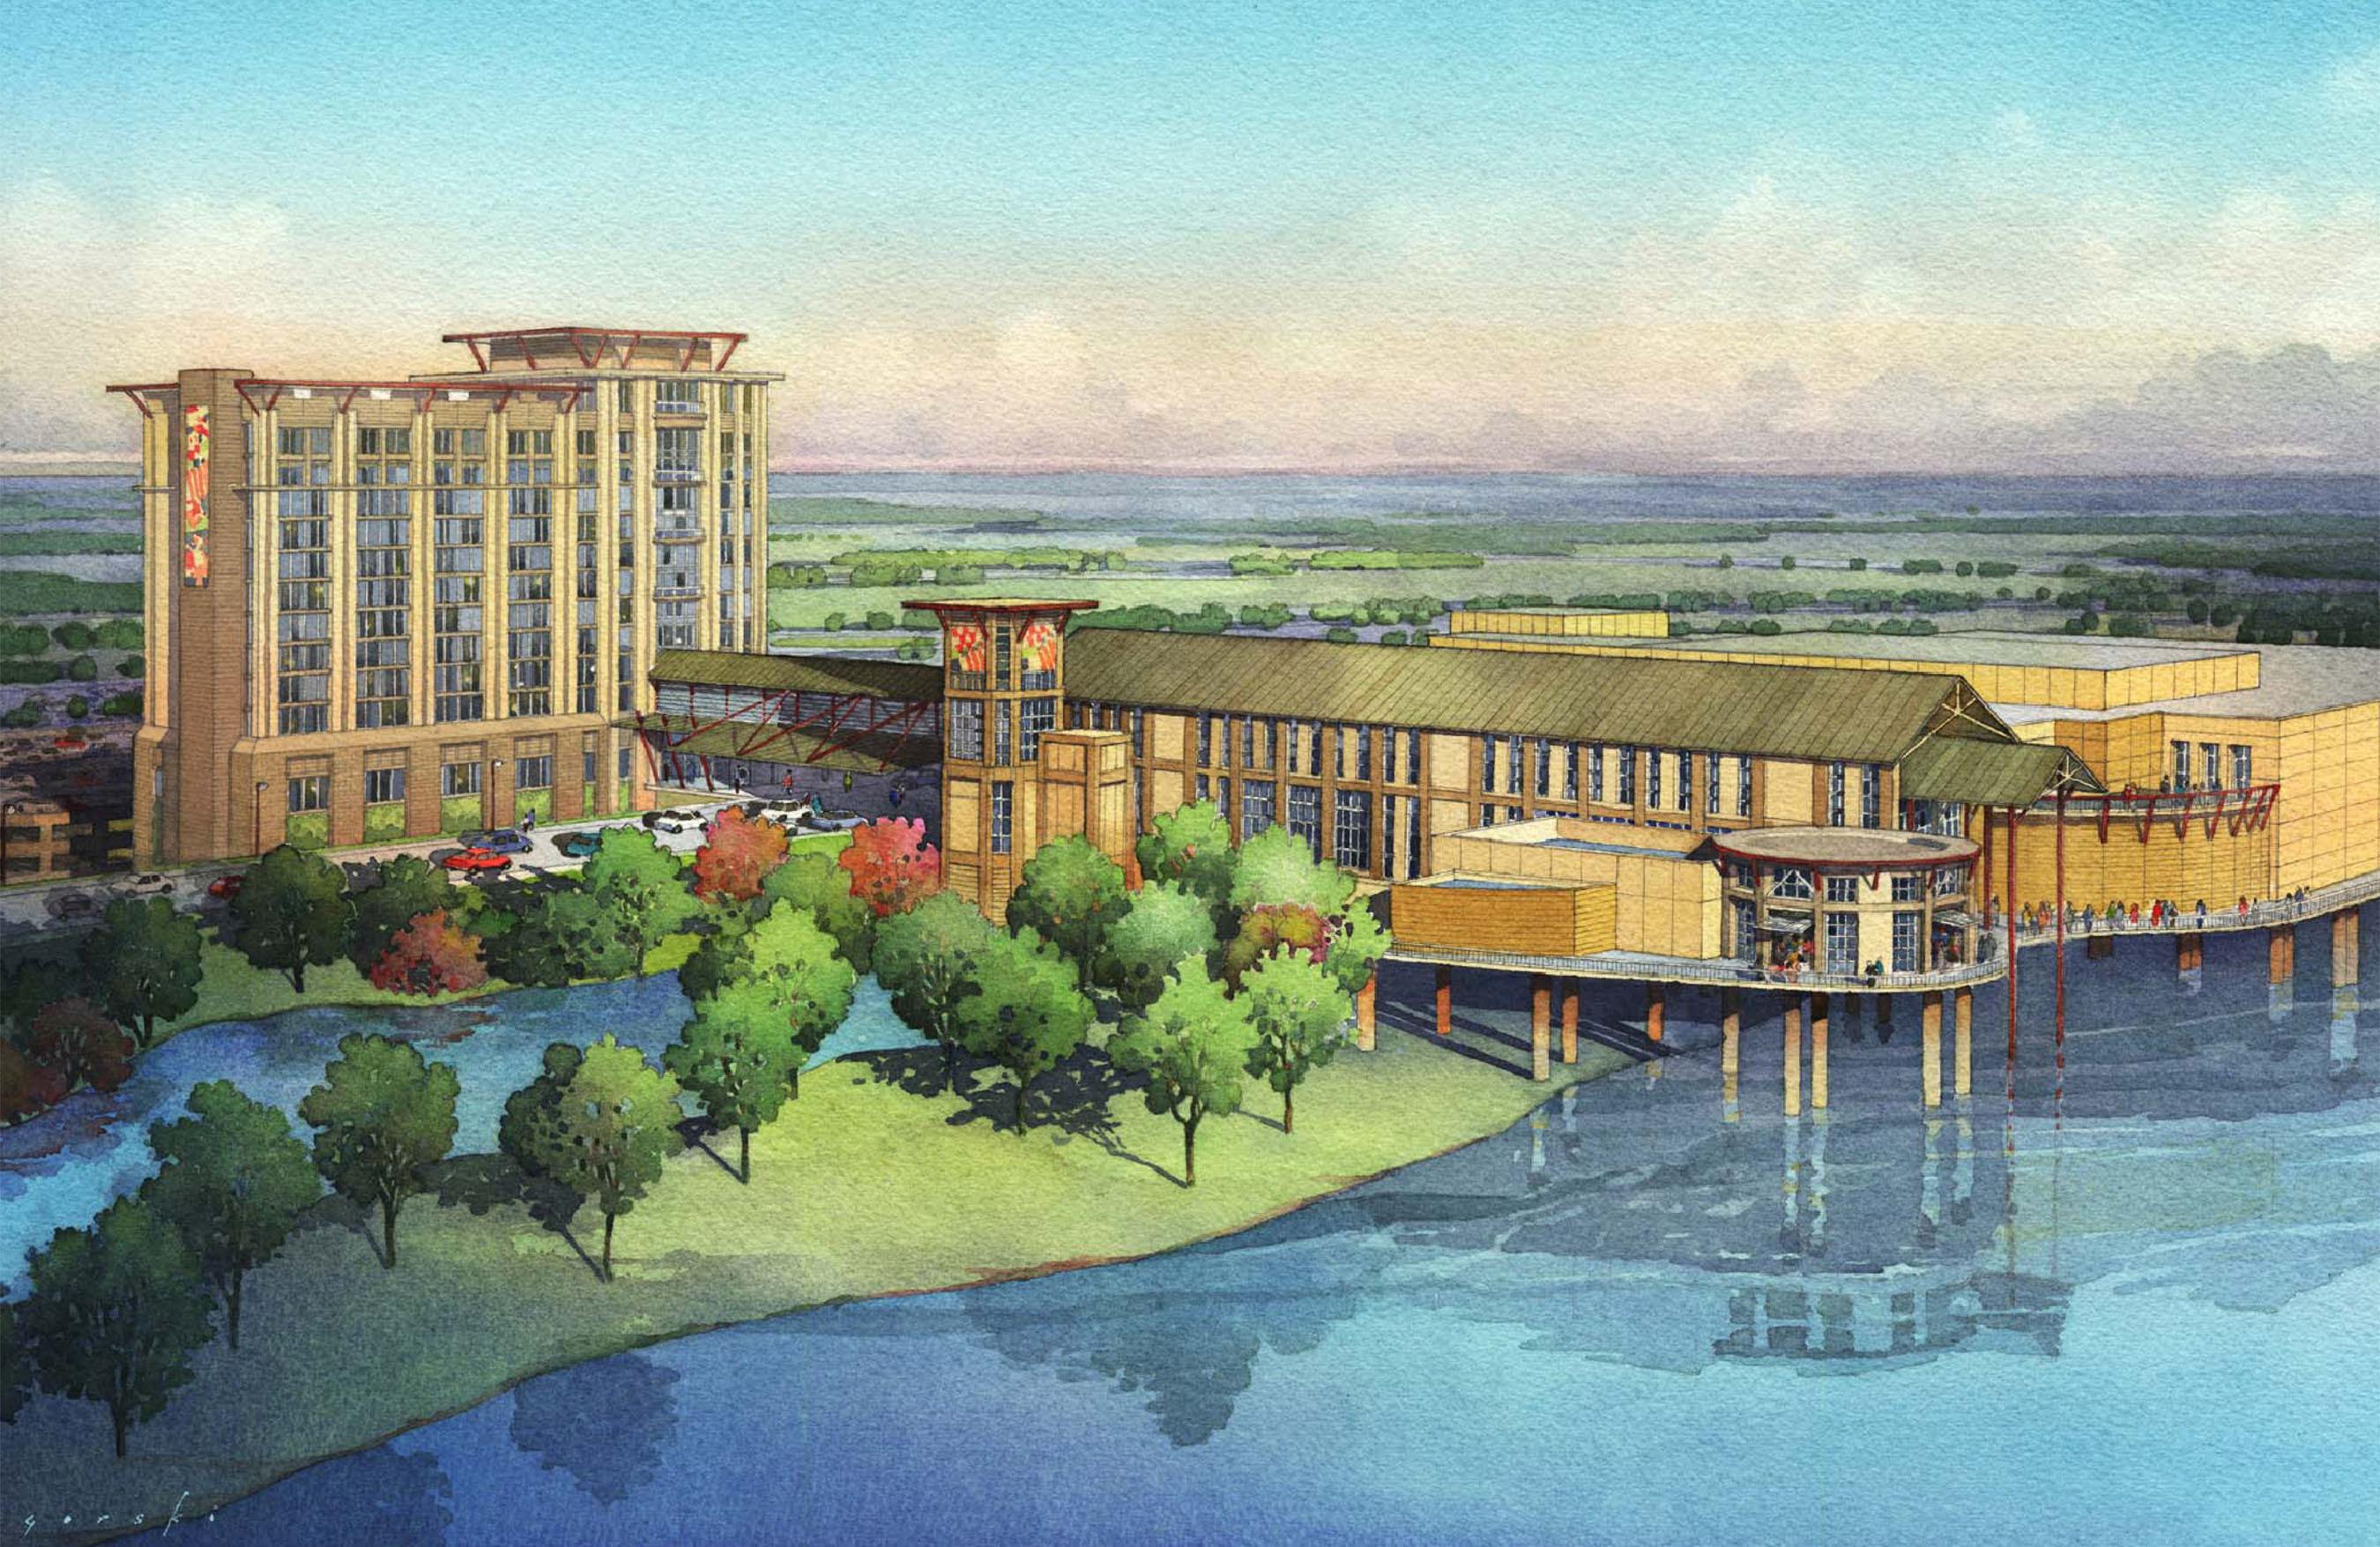 Largest Casinos in Baton Rouge